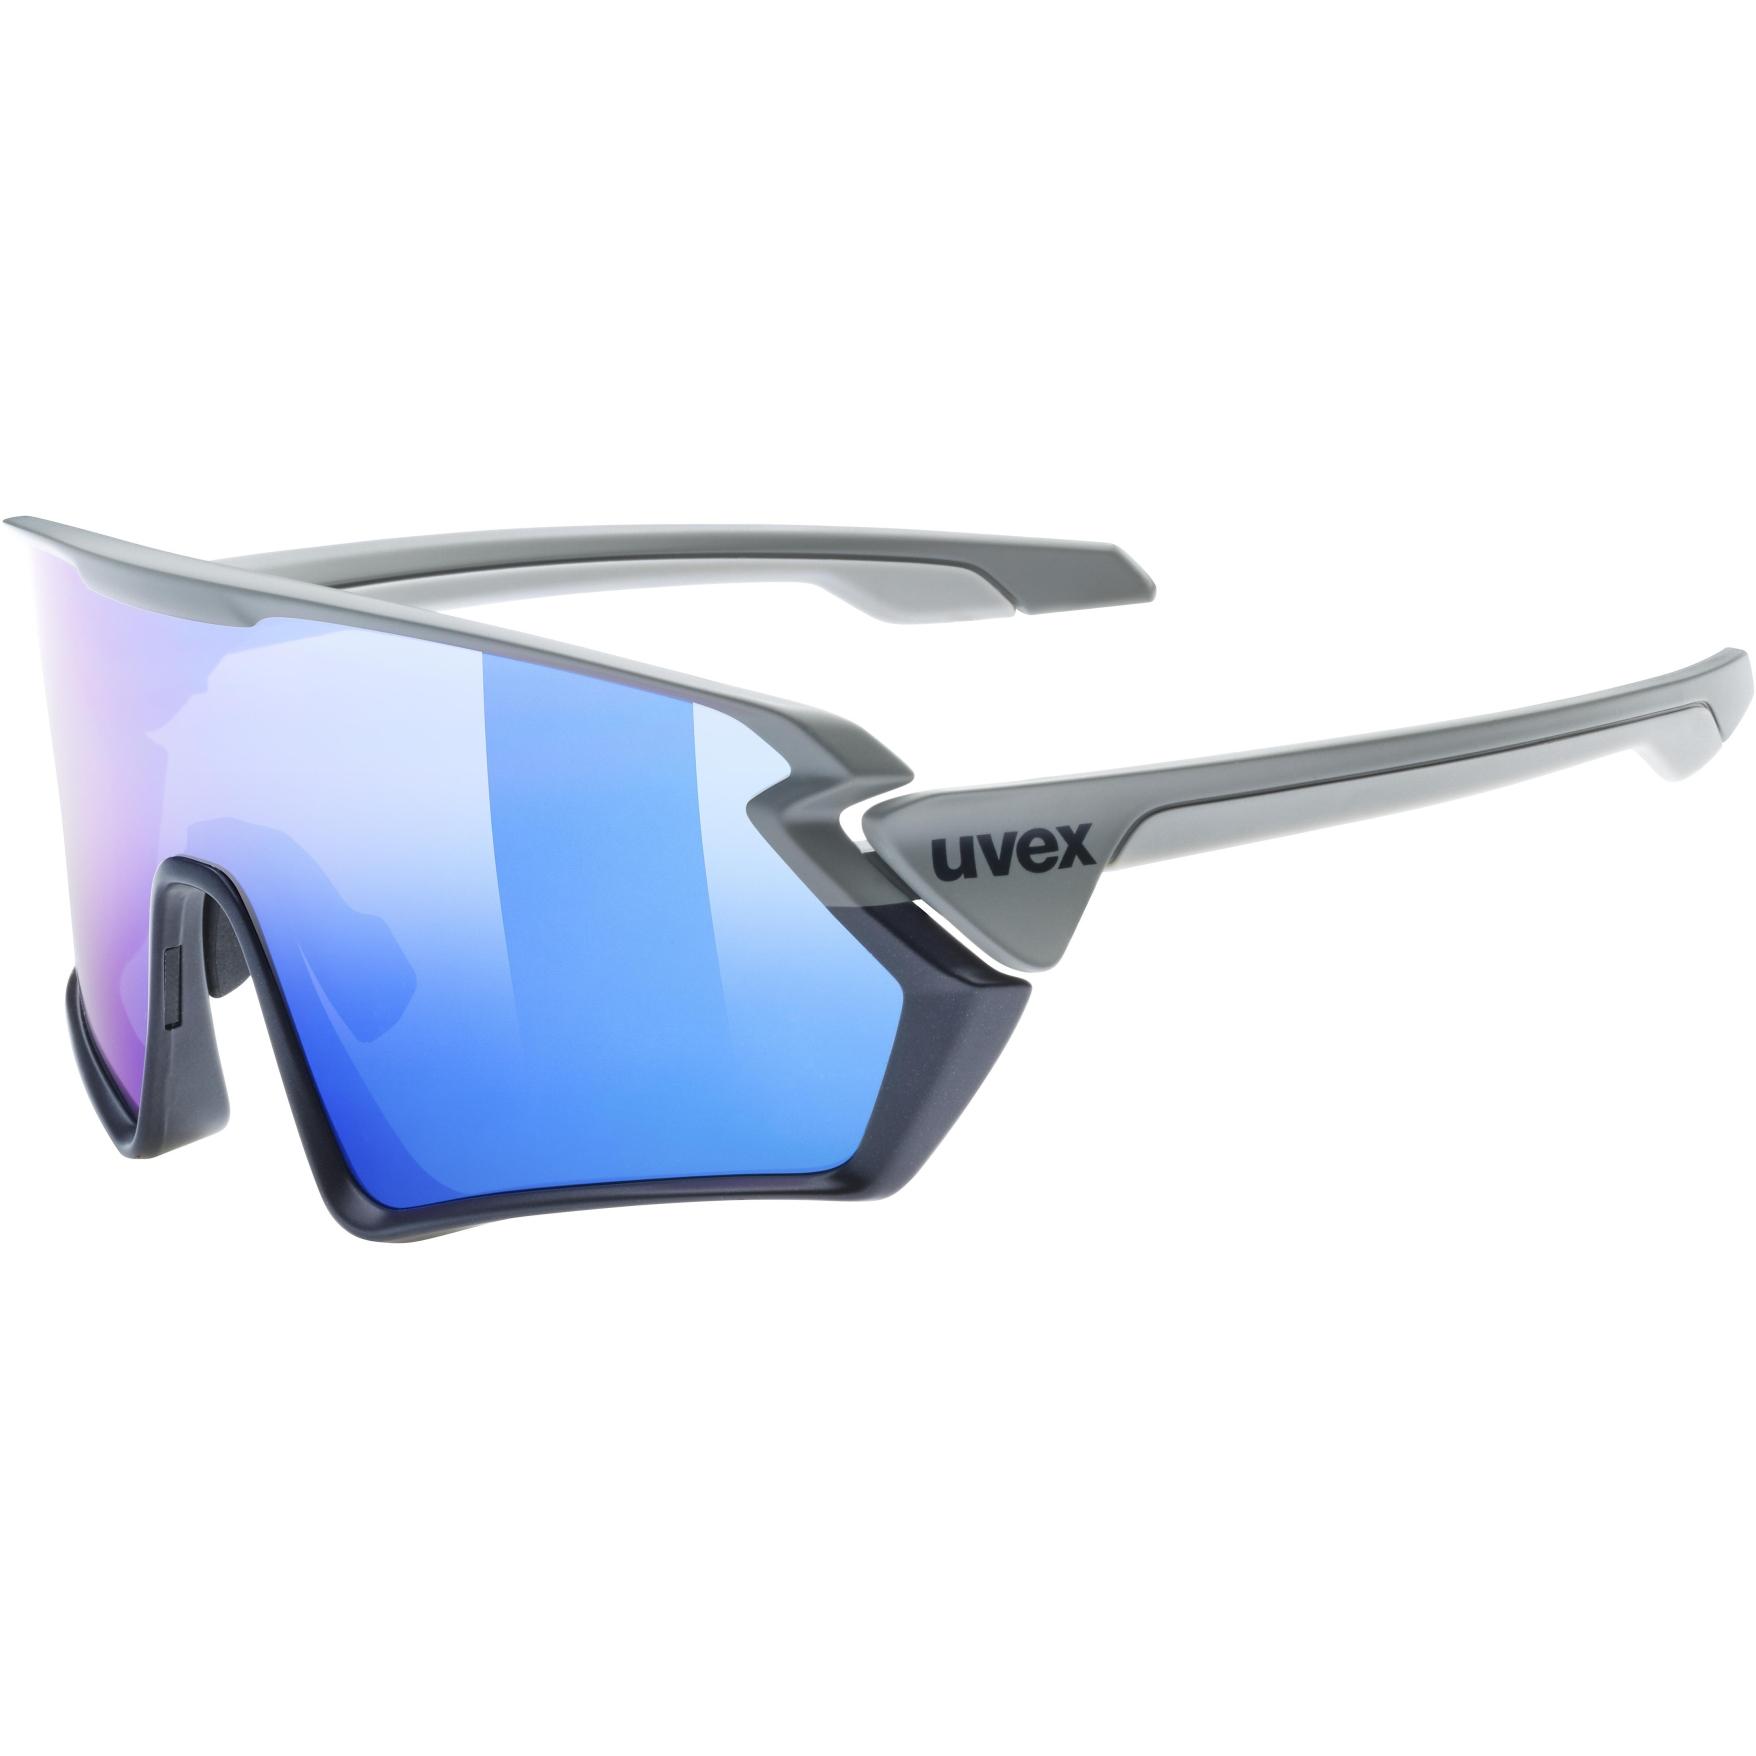 Uvex sportstyle 231 Glasses - rhino deep space mat/mirror blue